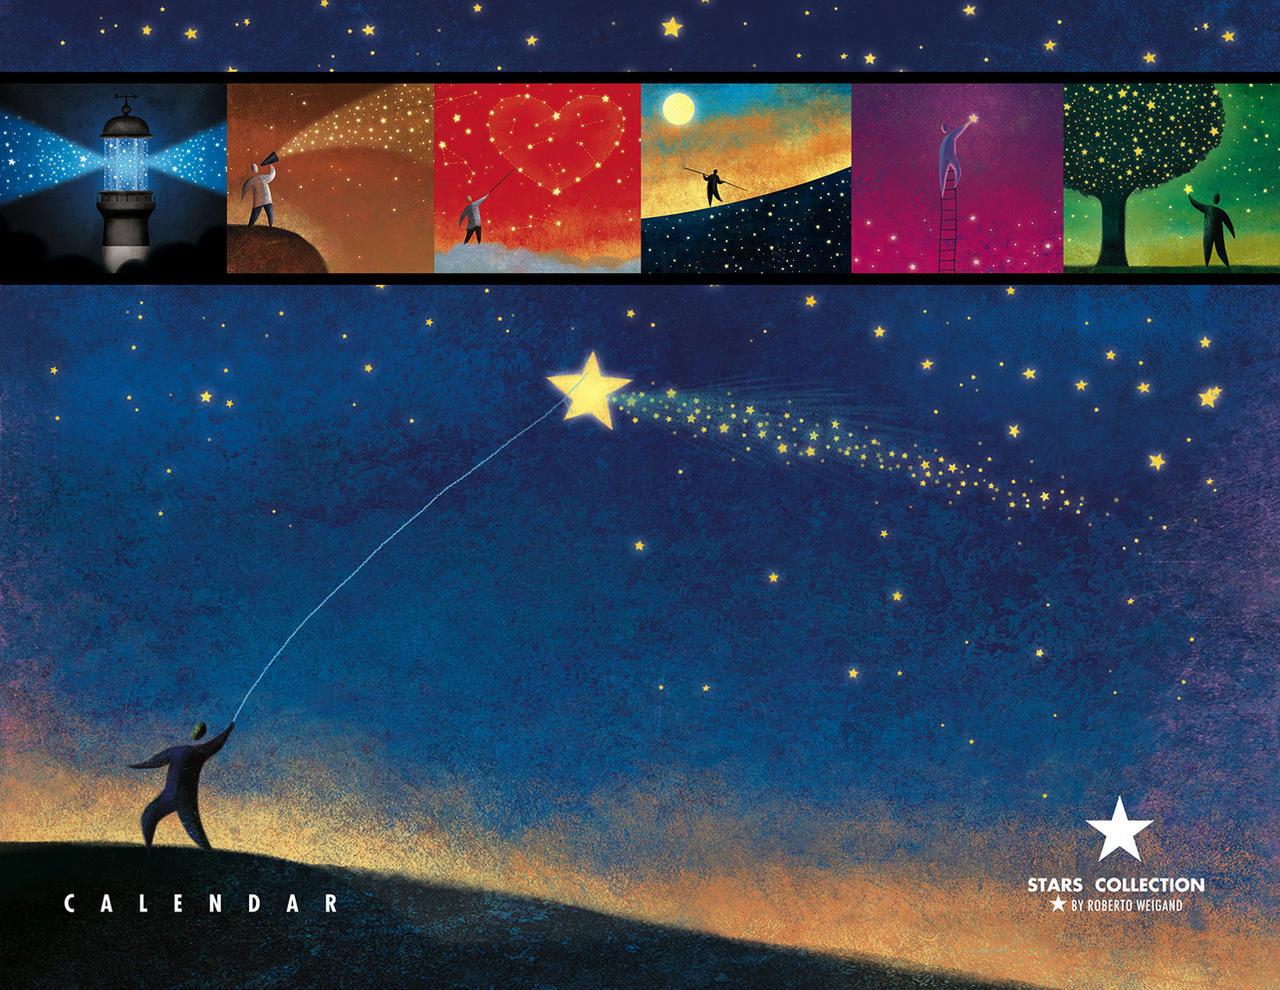 Stars Collection - Calendar